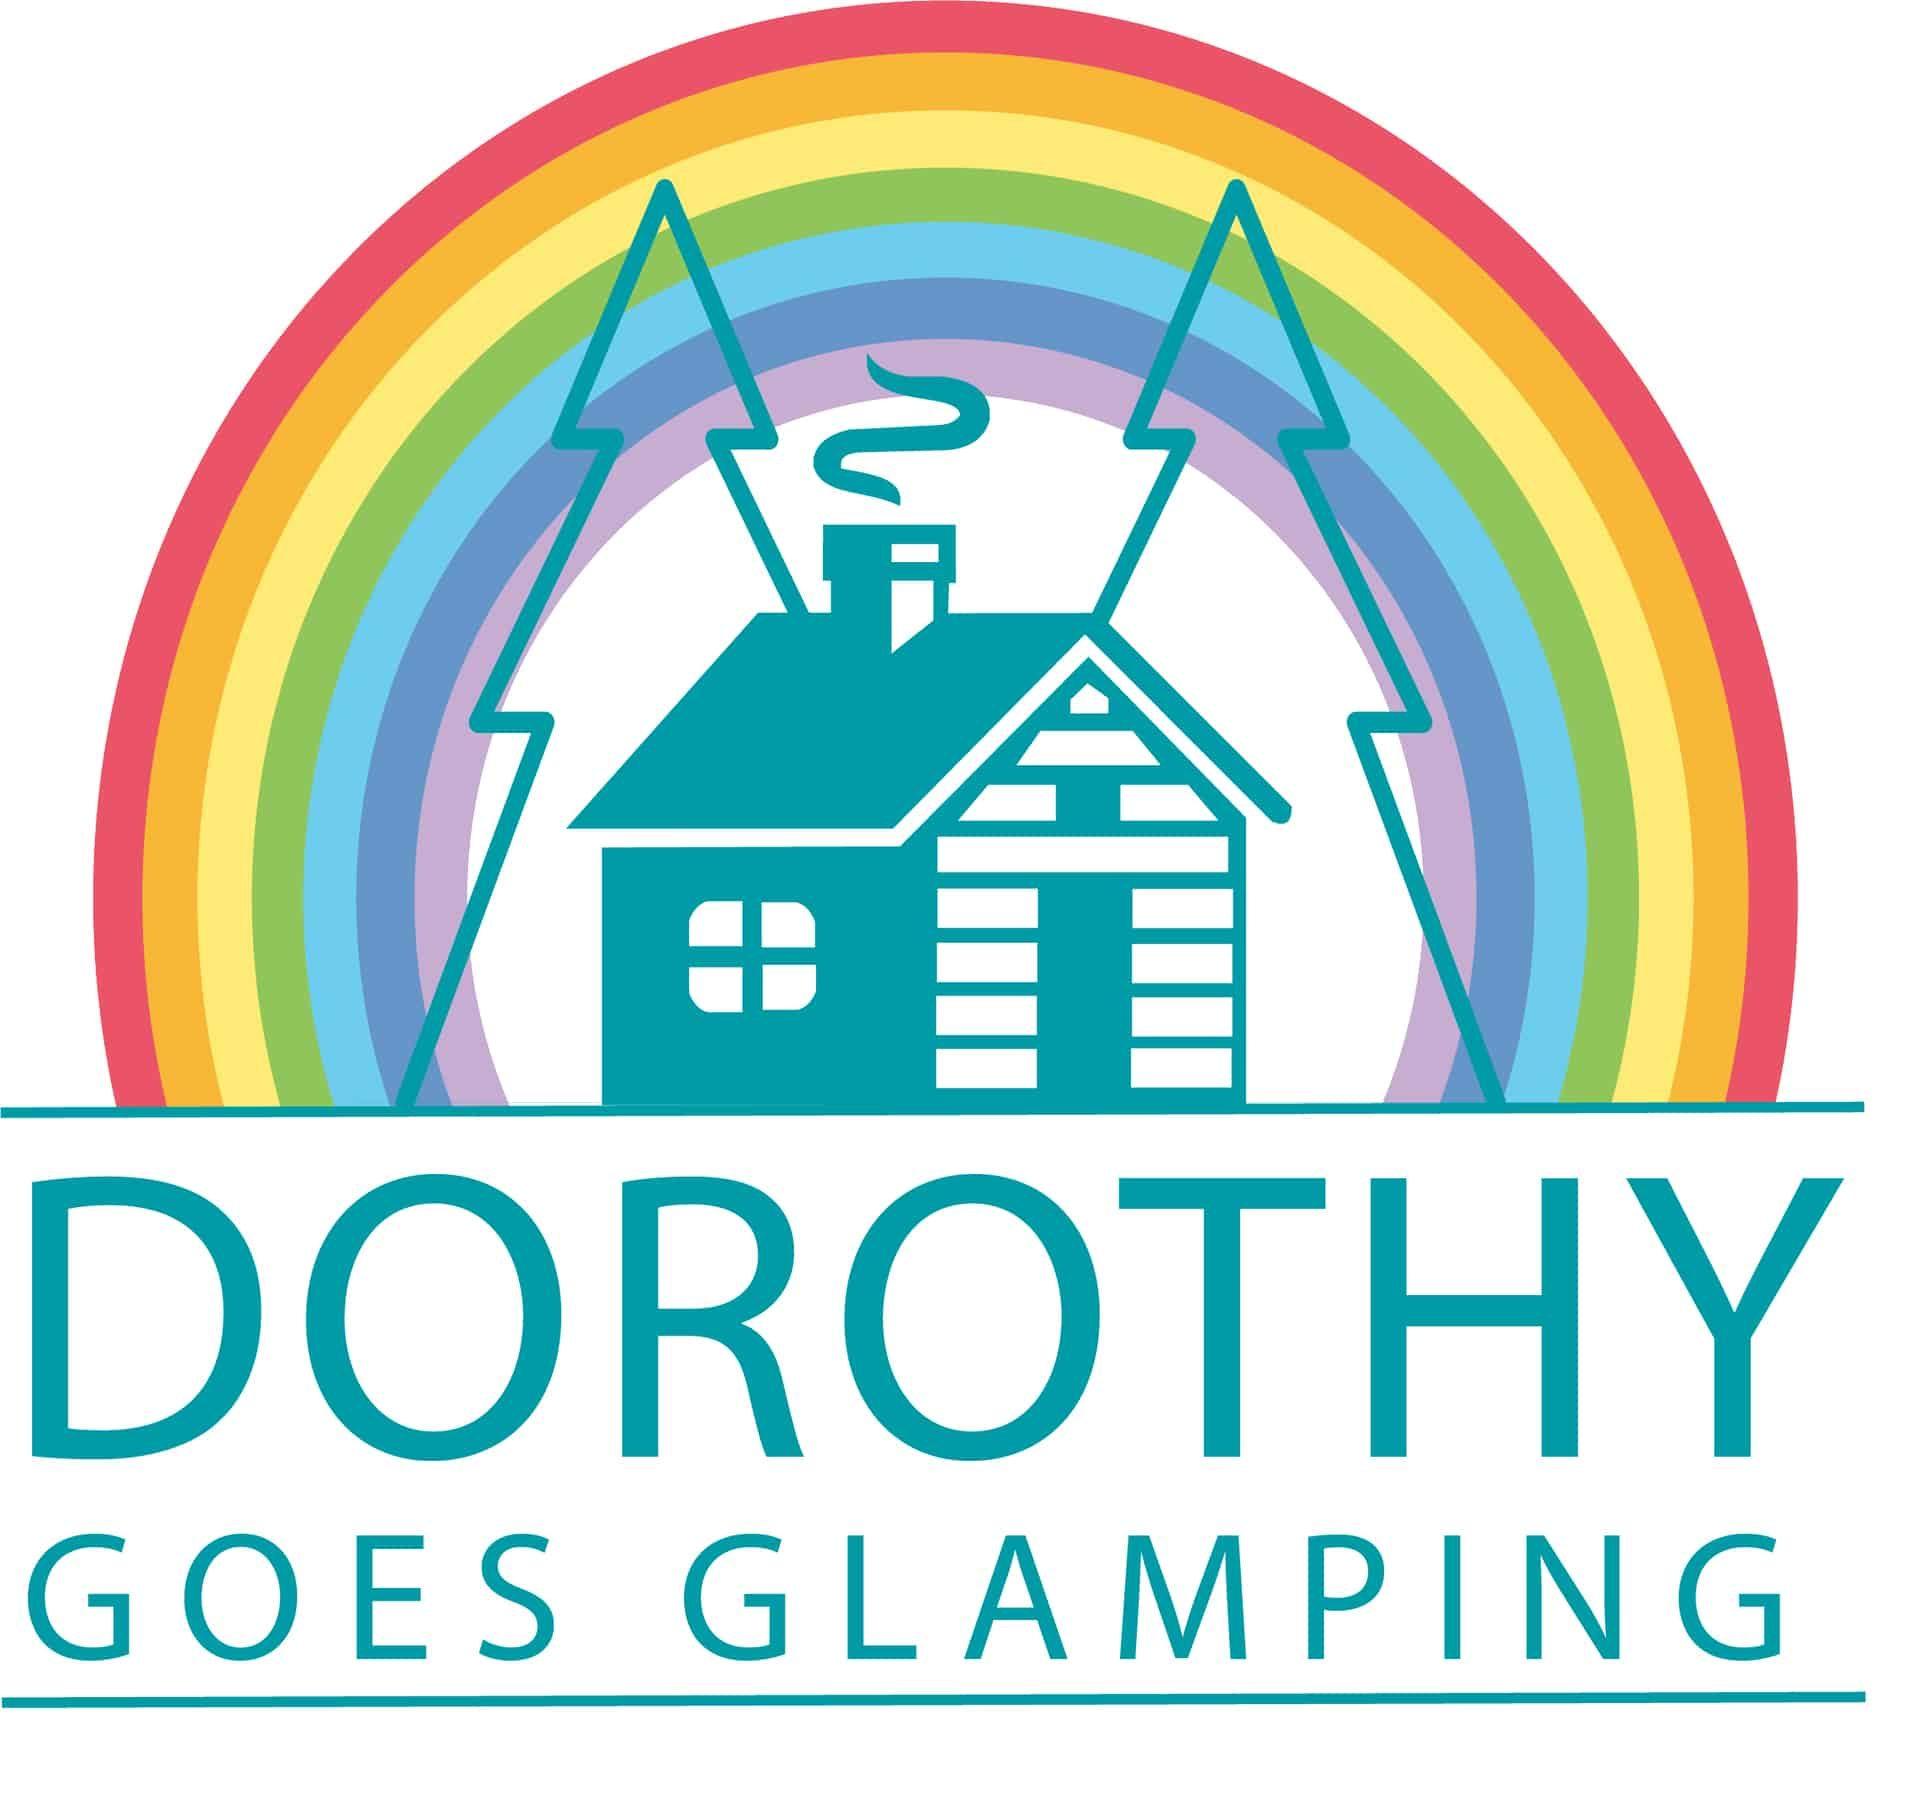 دوروثي يذهب Glamping